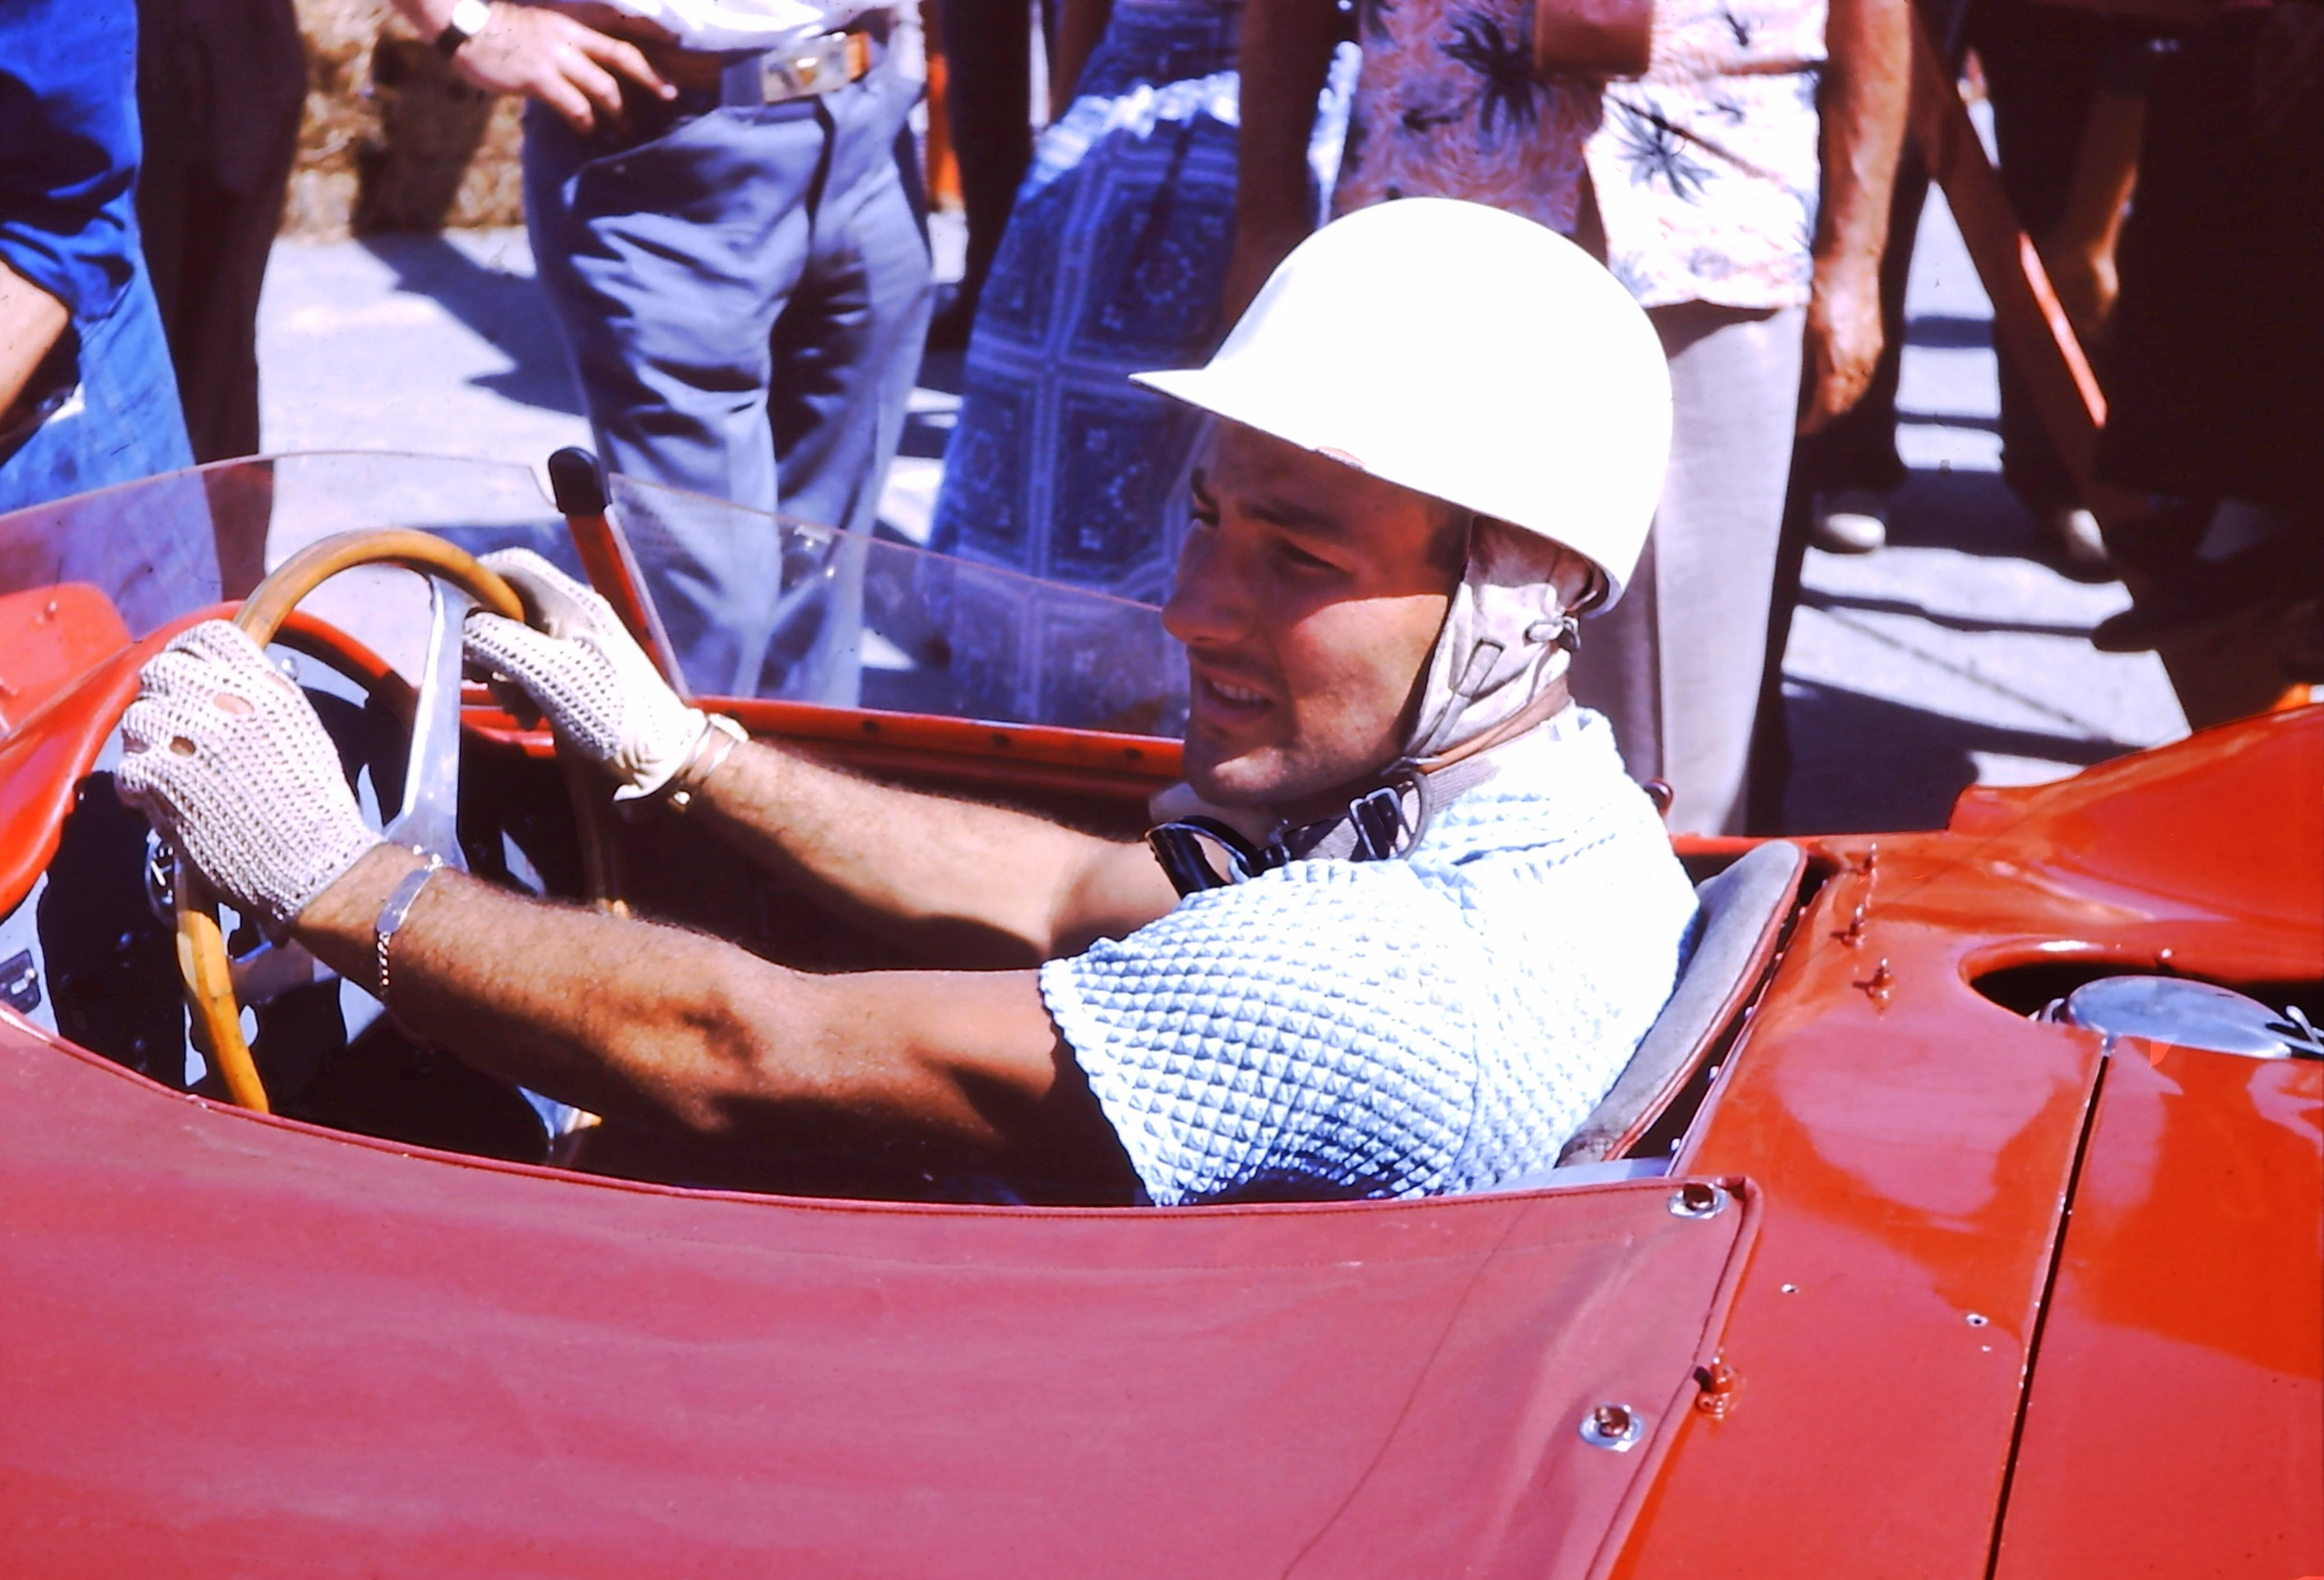 1957 Sebring - Stirling Moss in Nassau polo in his Maserati 300S (c) GBussian